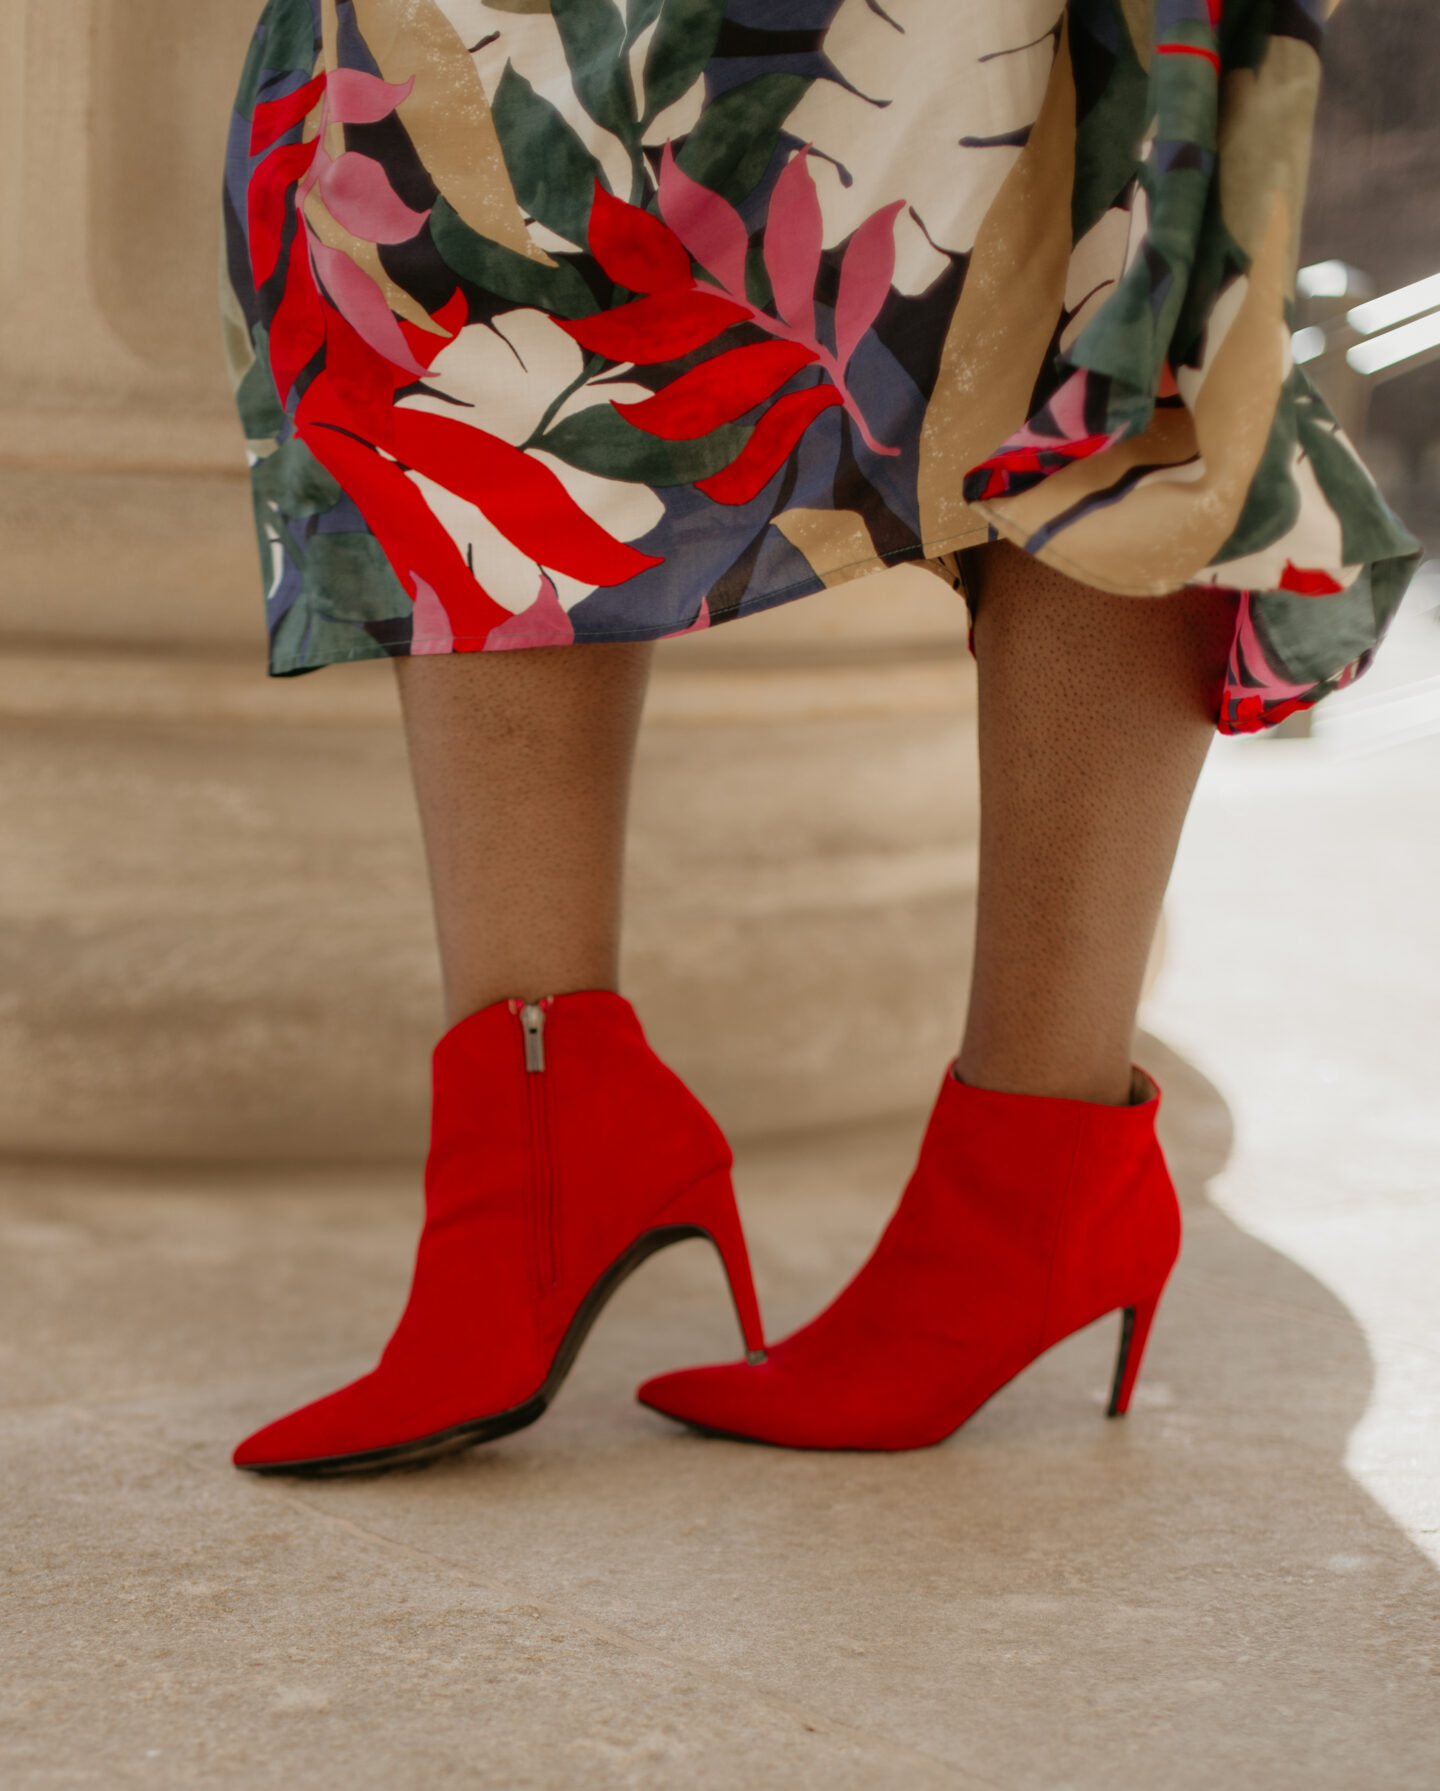 red-floral-prints-spring-target-dress-red-boots-hypnozglam